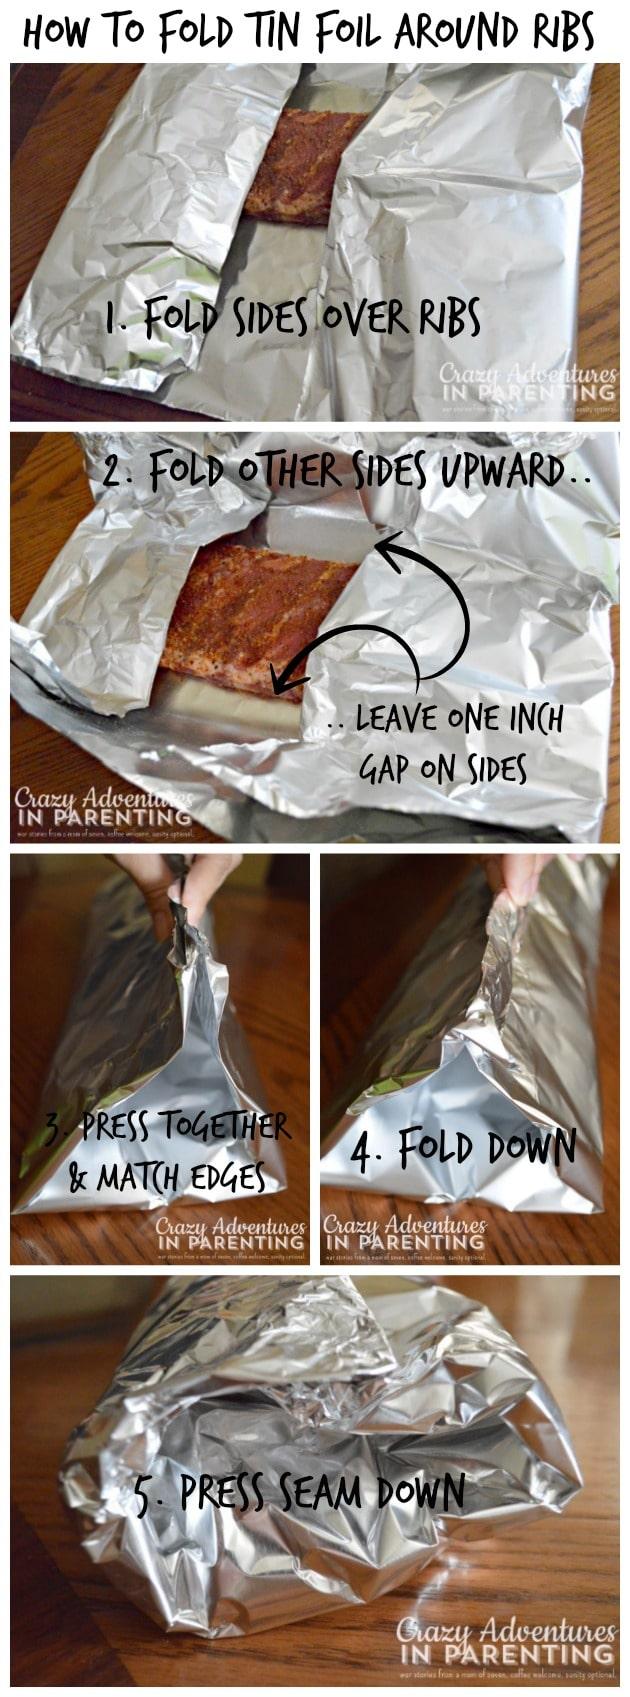 How to Fold Tin Foil Around Ribs